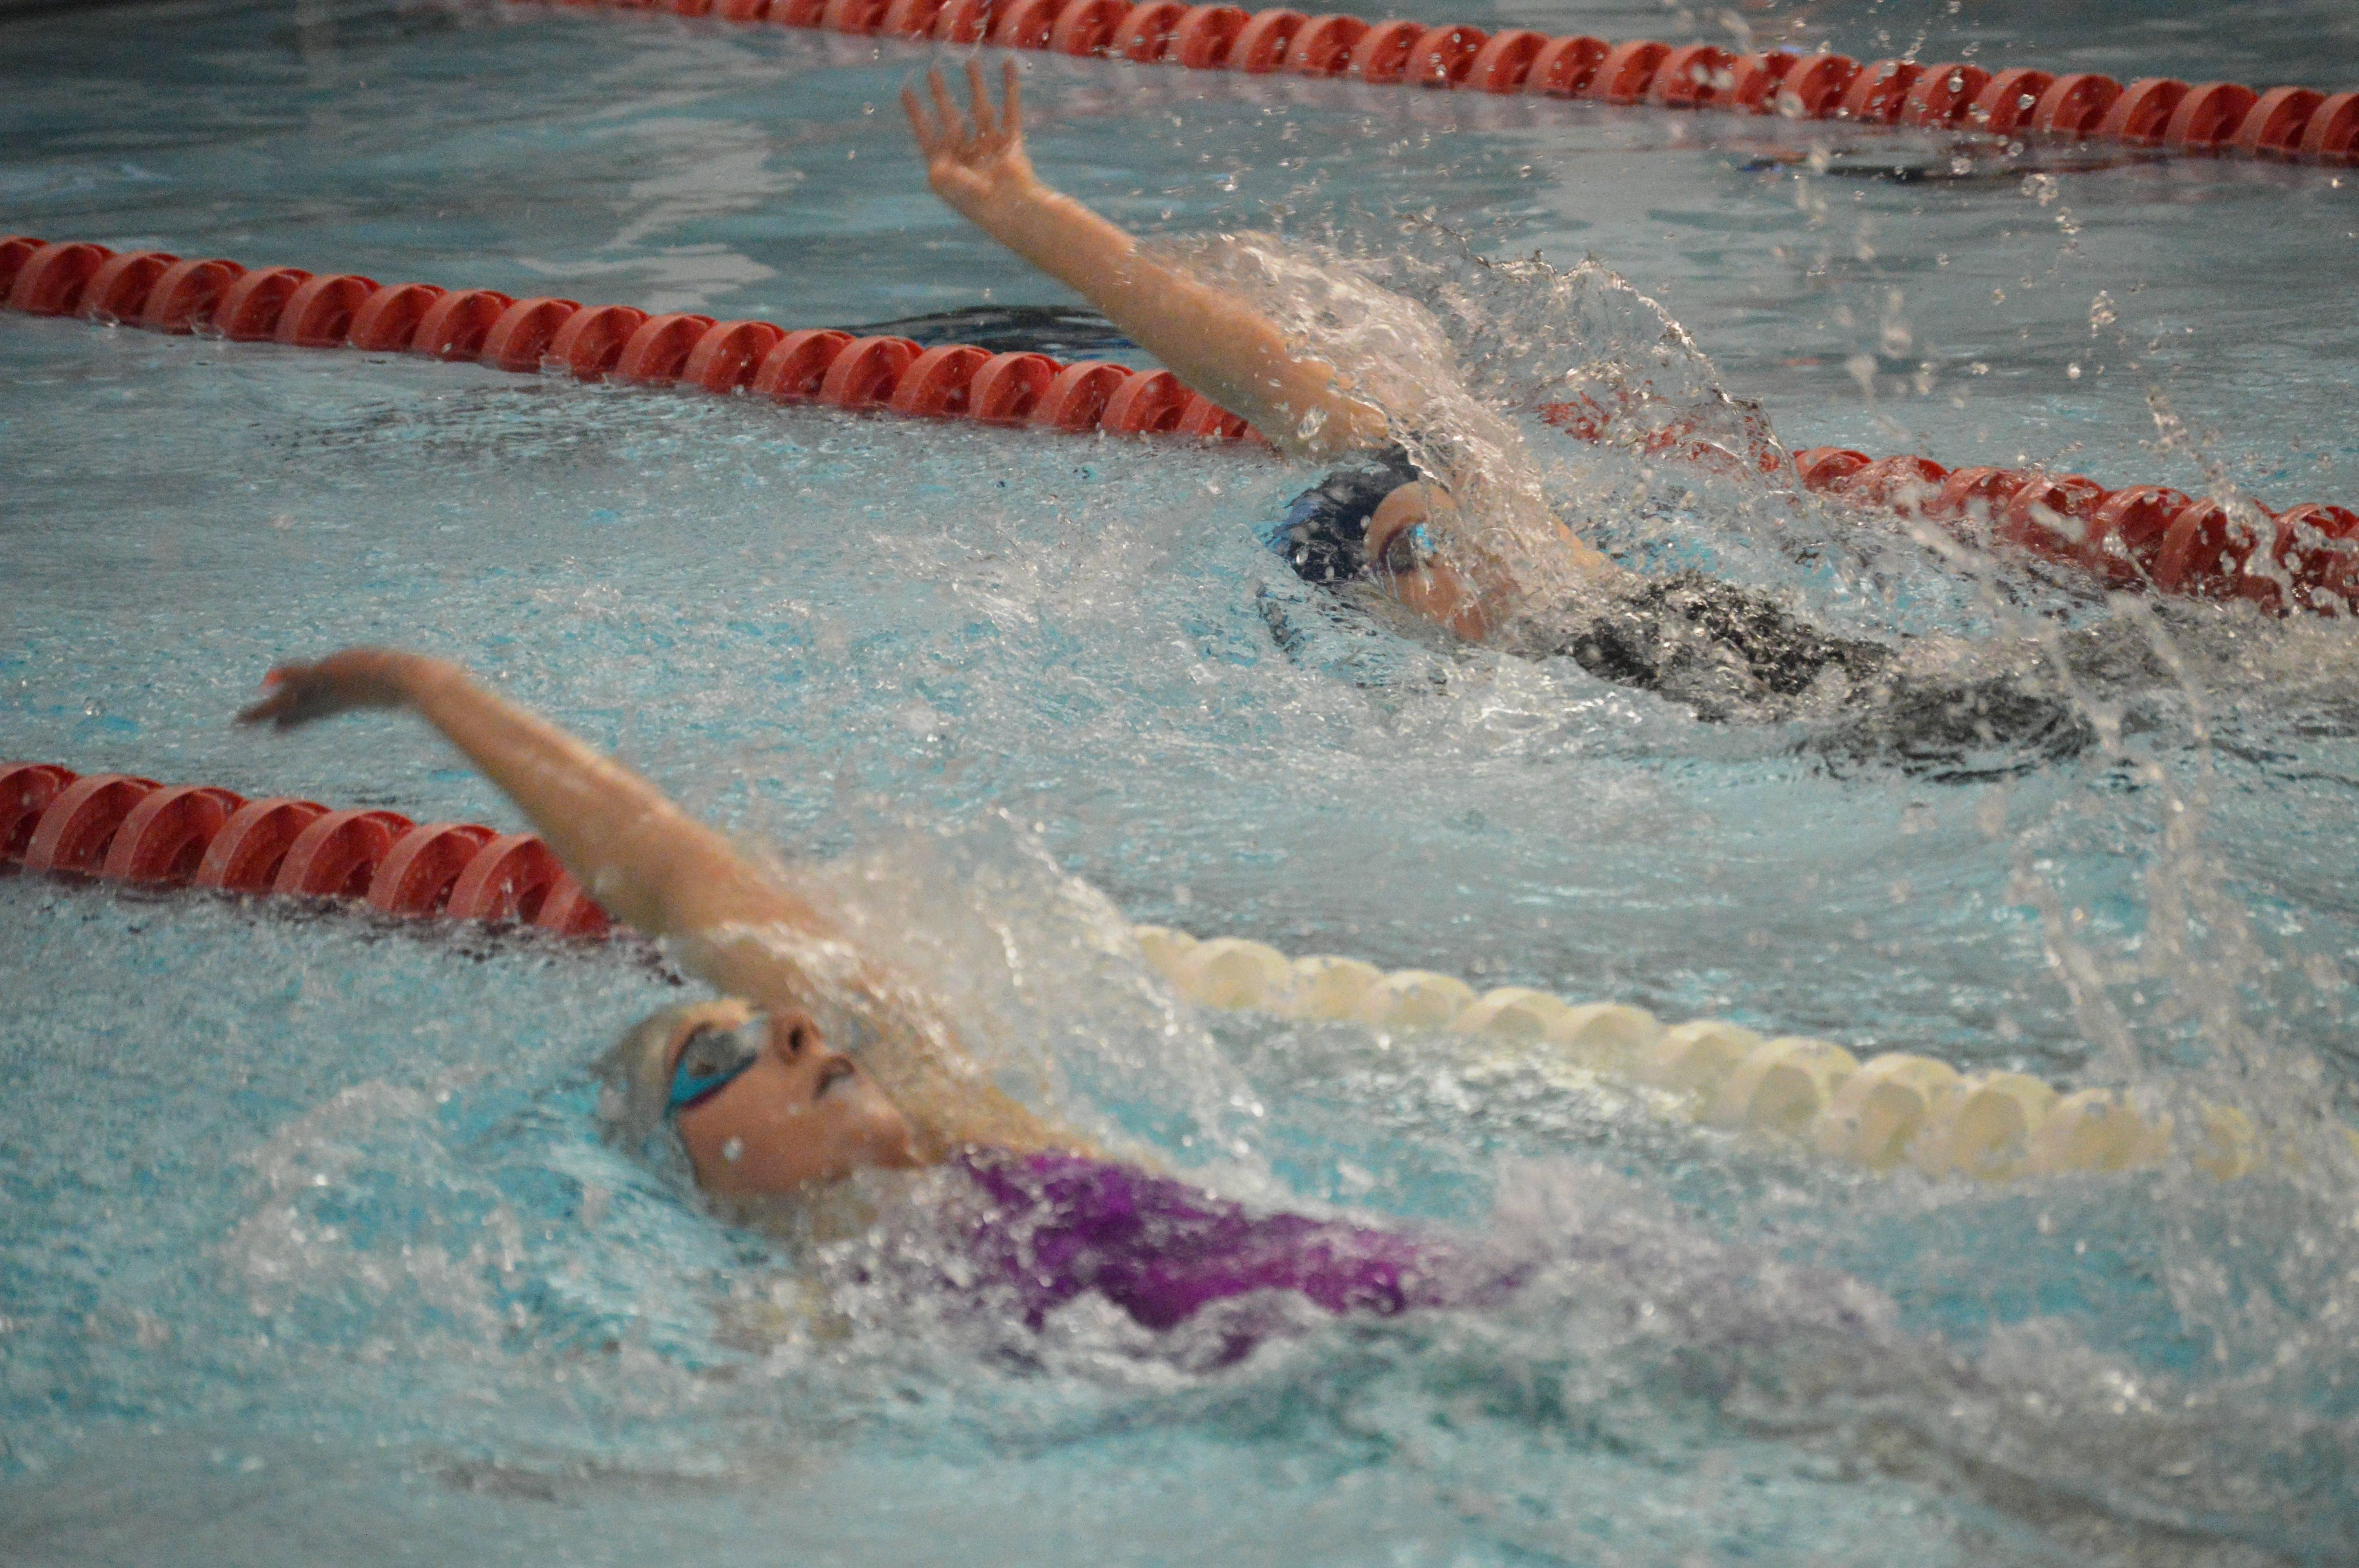 42e587d1d1fd99569486_78690ff124fc55330c21_1-10-17_girls_backstroke_race.JPG